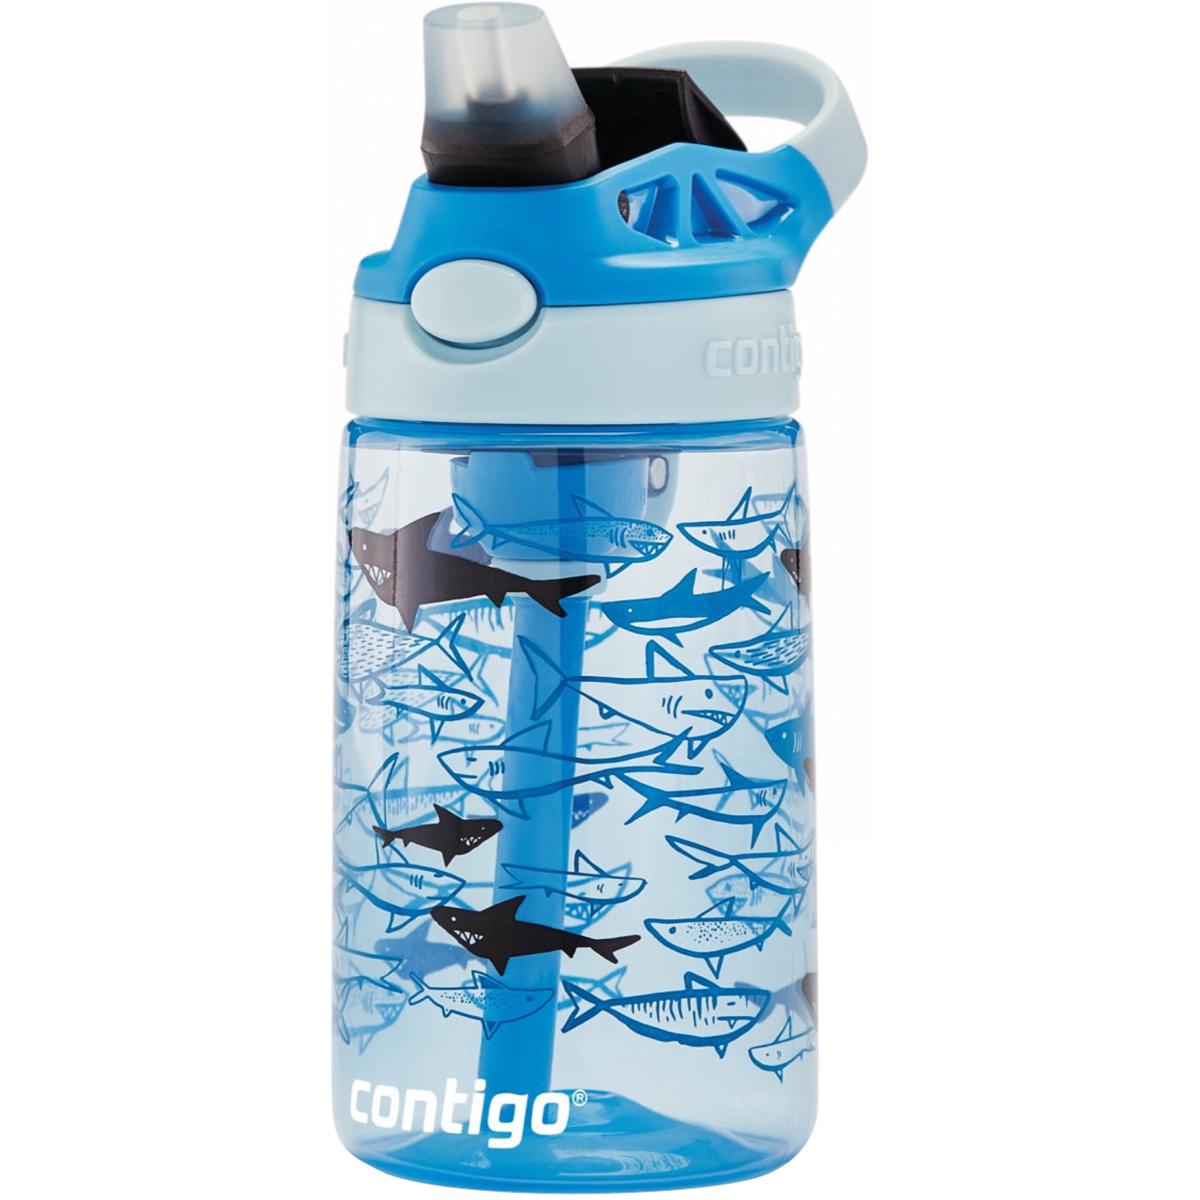 Contigo-Kid-039-s-14-oz-AutoSpout-Straw-Water-Bottle-with-Easy-Clean-Lid thumbnail 34